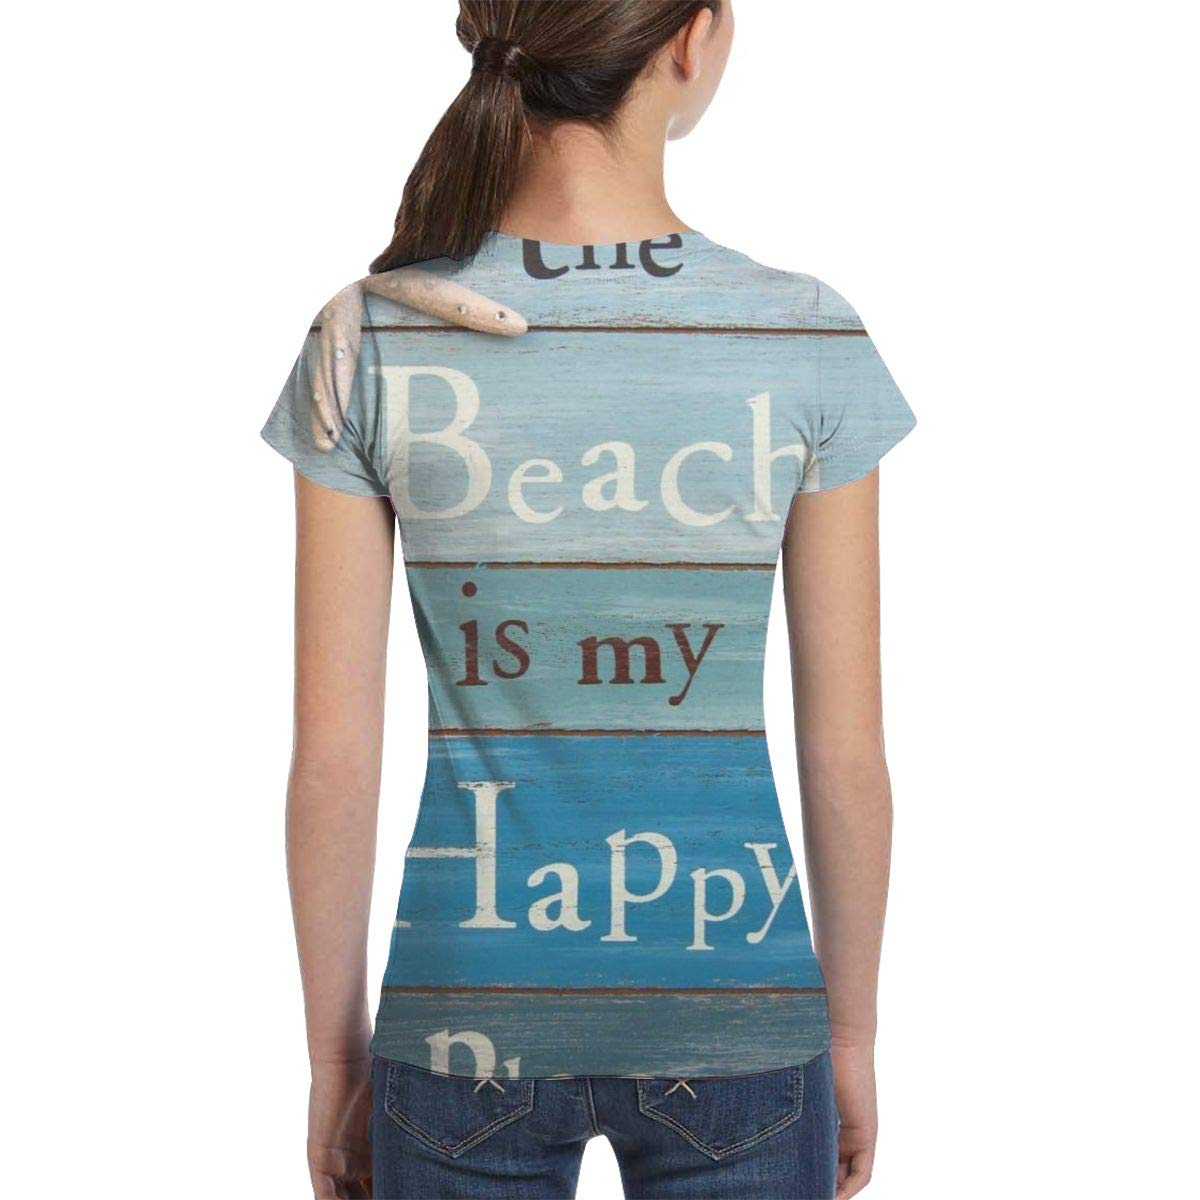 XS-XL L6Nv4o@A Girls Short Sleeve Beach Themed Doormats Rugs-The Beach is My Happy Place Shirts Fashion Tunic Shirt Dress